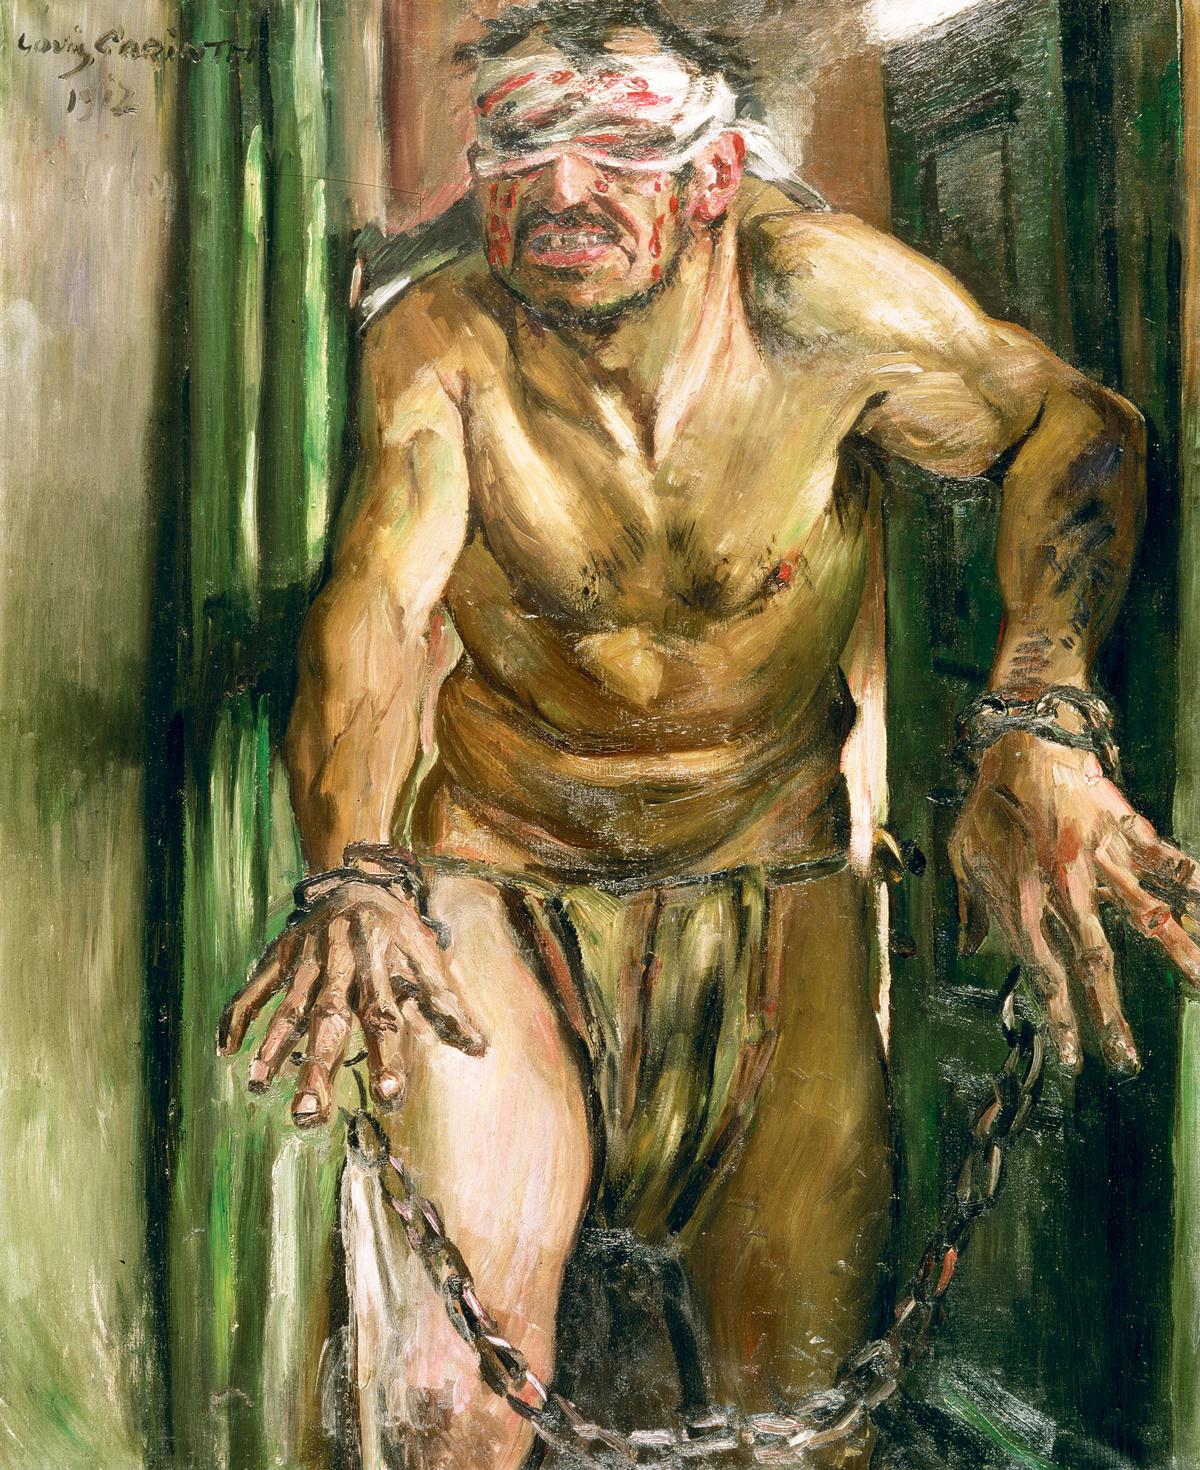 Samson Blinded, by Lovis Corinth, 1912. Alte Nationalgalerie, Berlin, Germany.